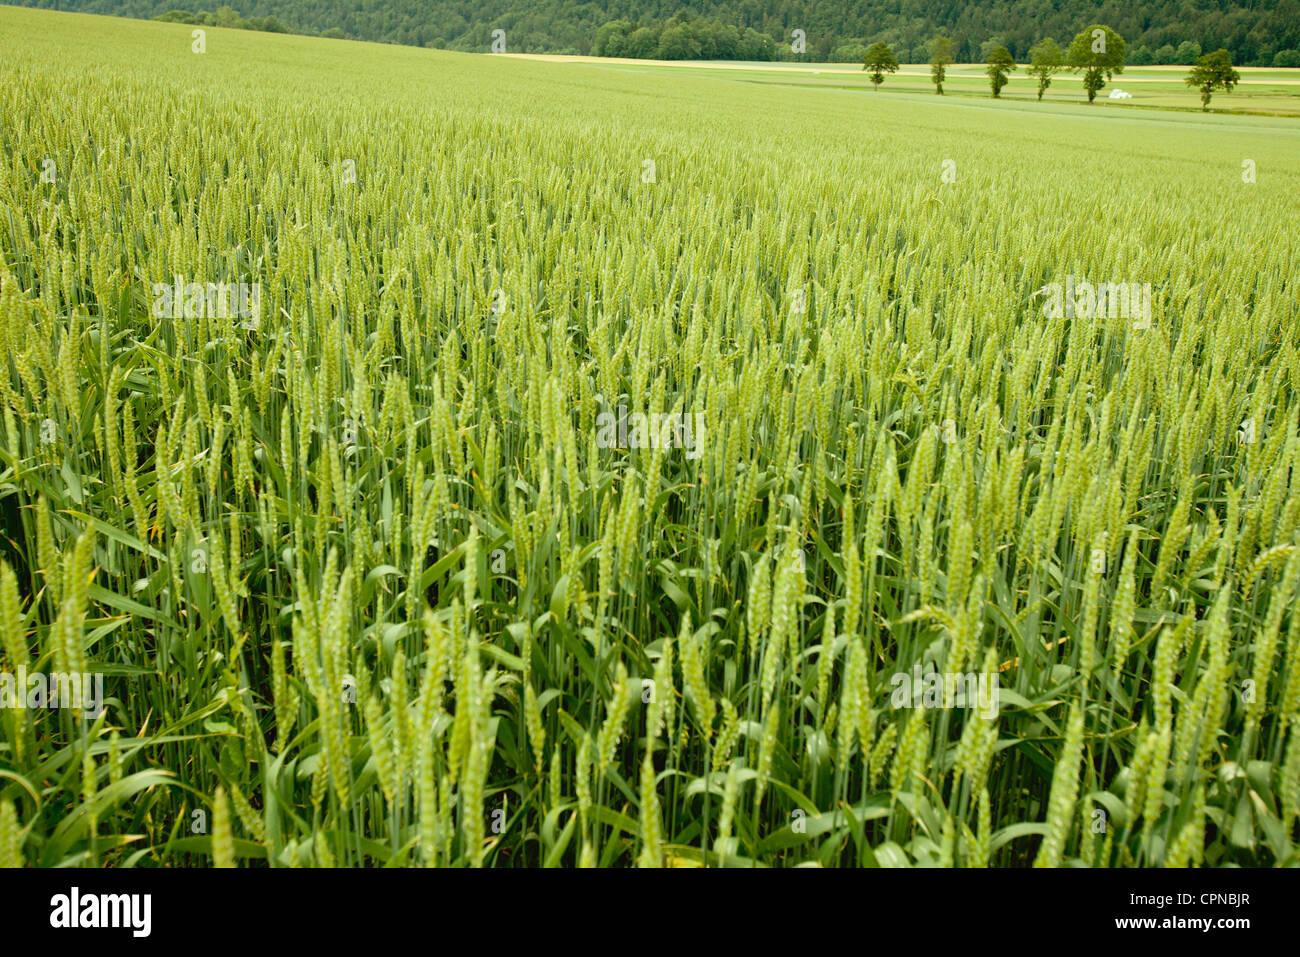 Wheat growing in field - Stock Image